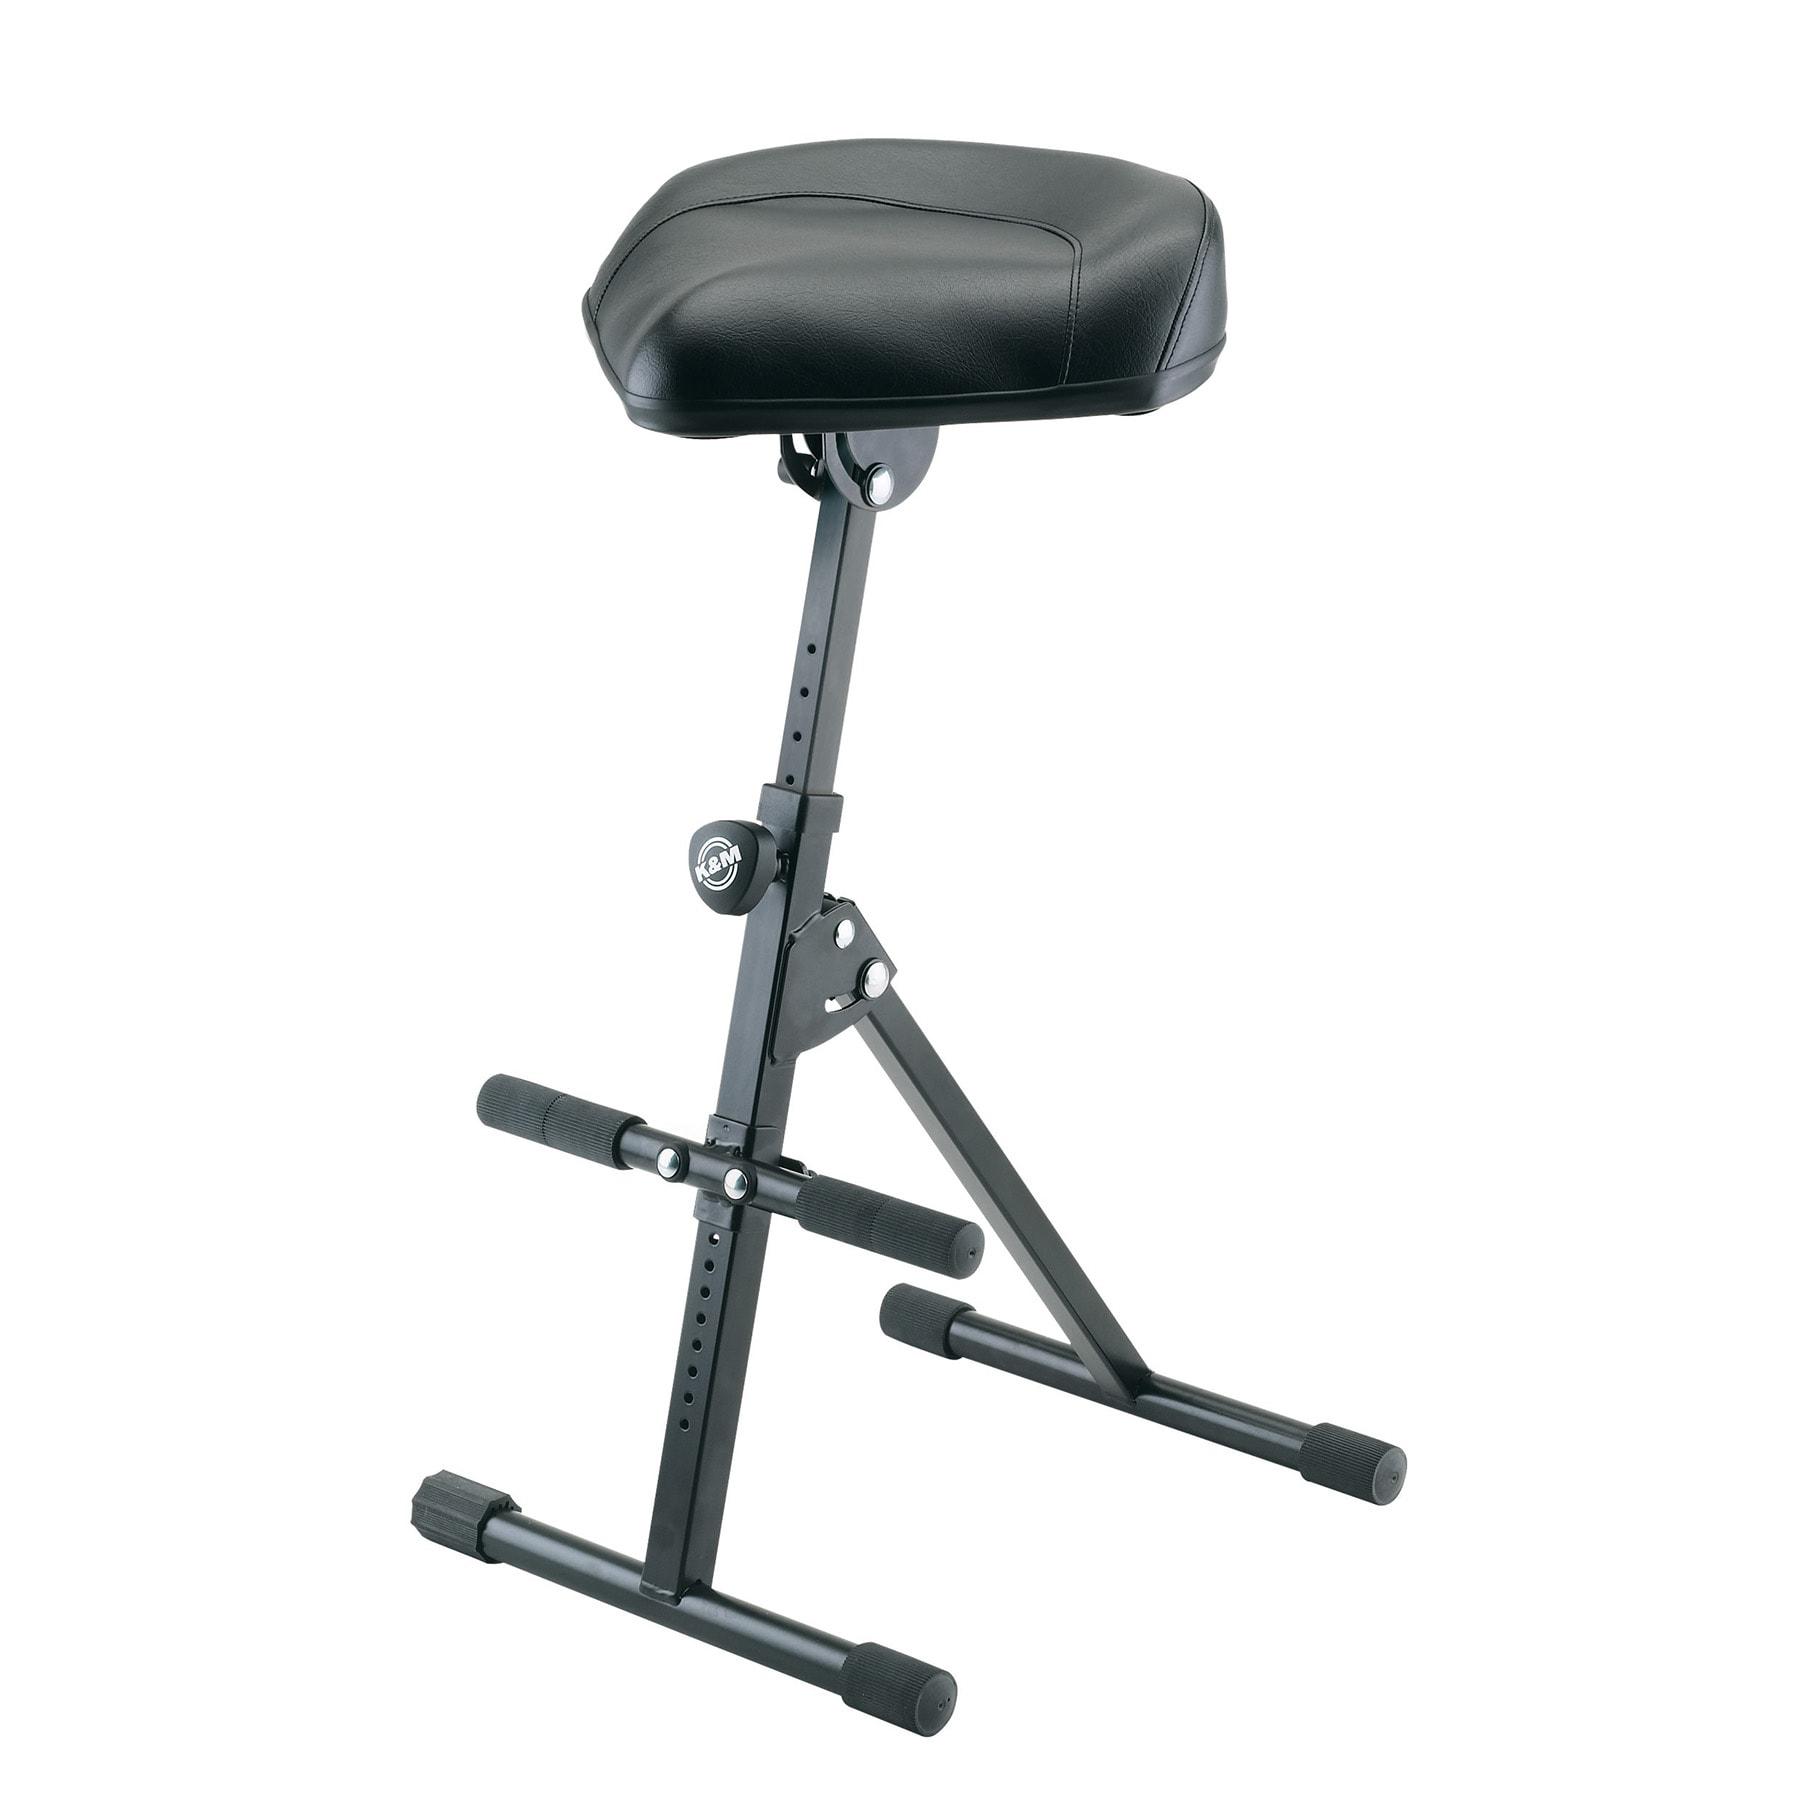 KM14047 - Pneumatic stool